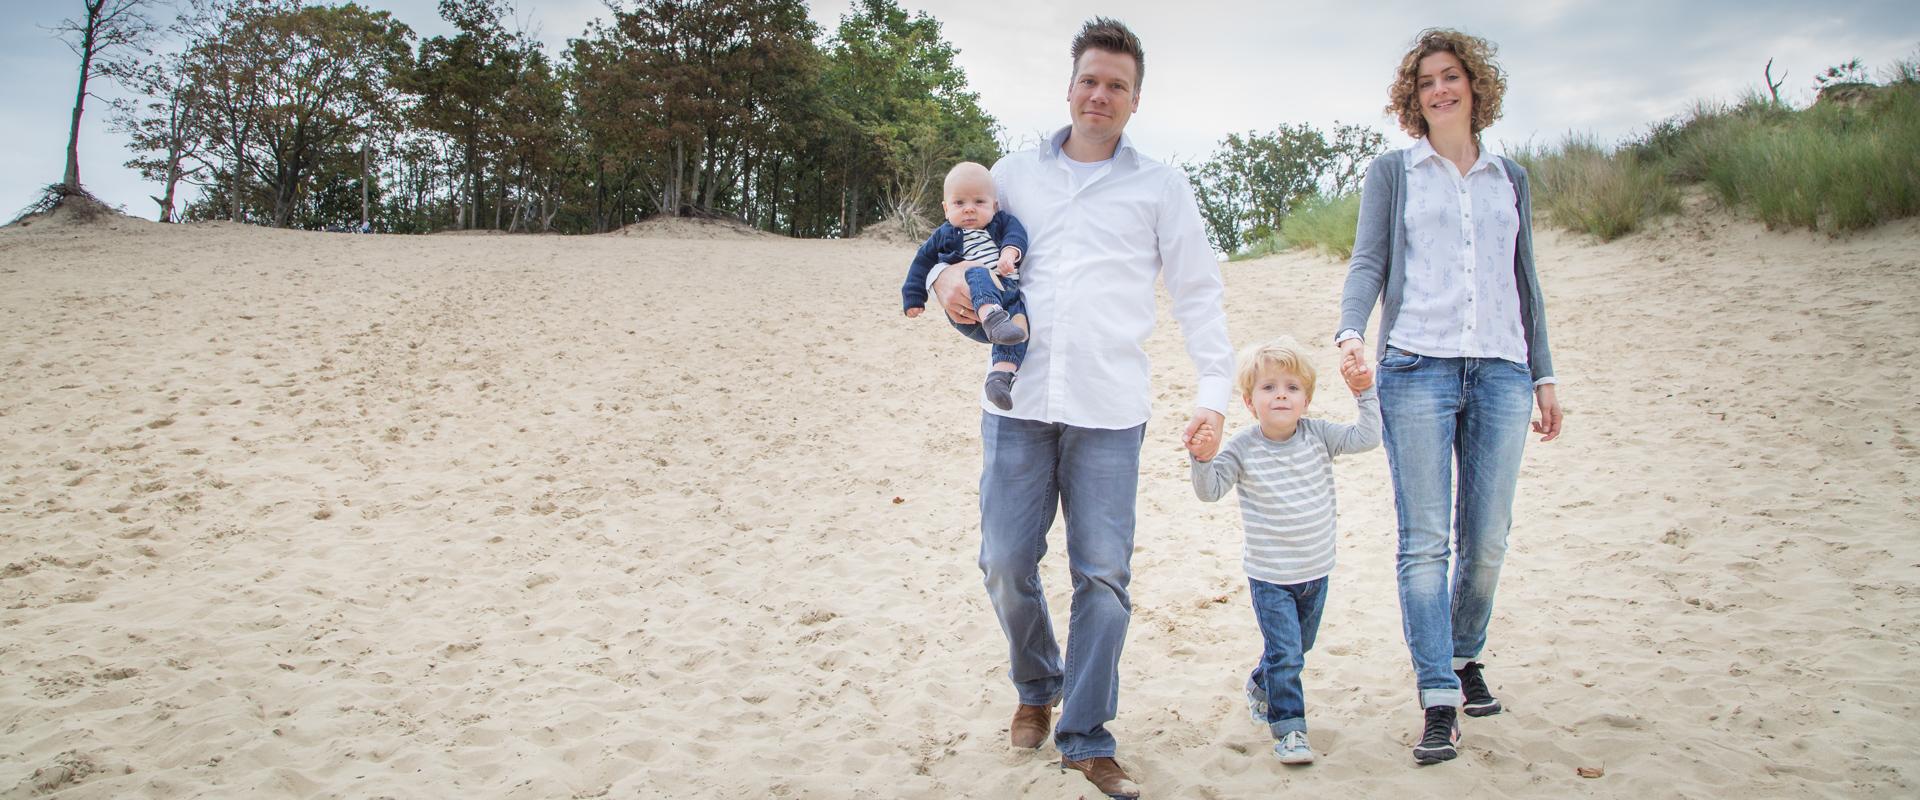 familie fotoshoot amsterdam minishoot